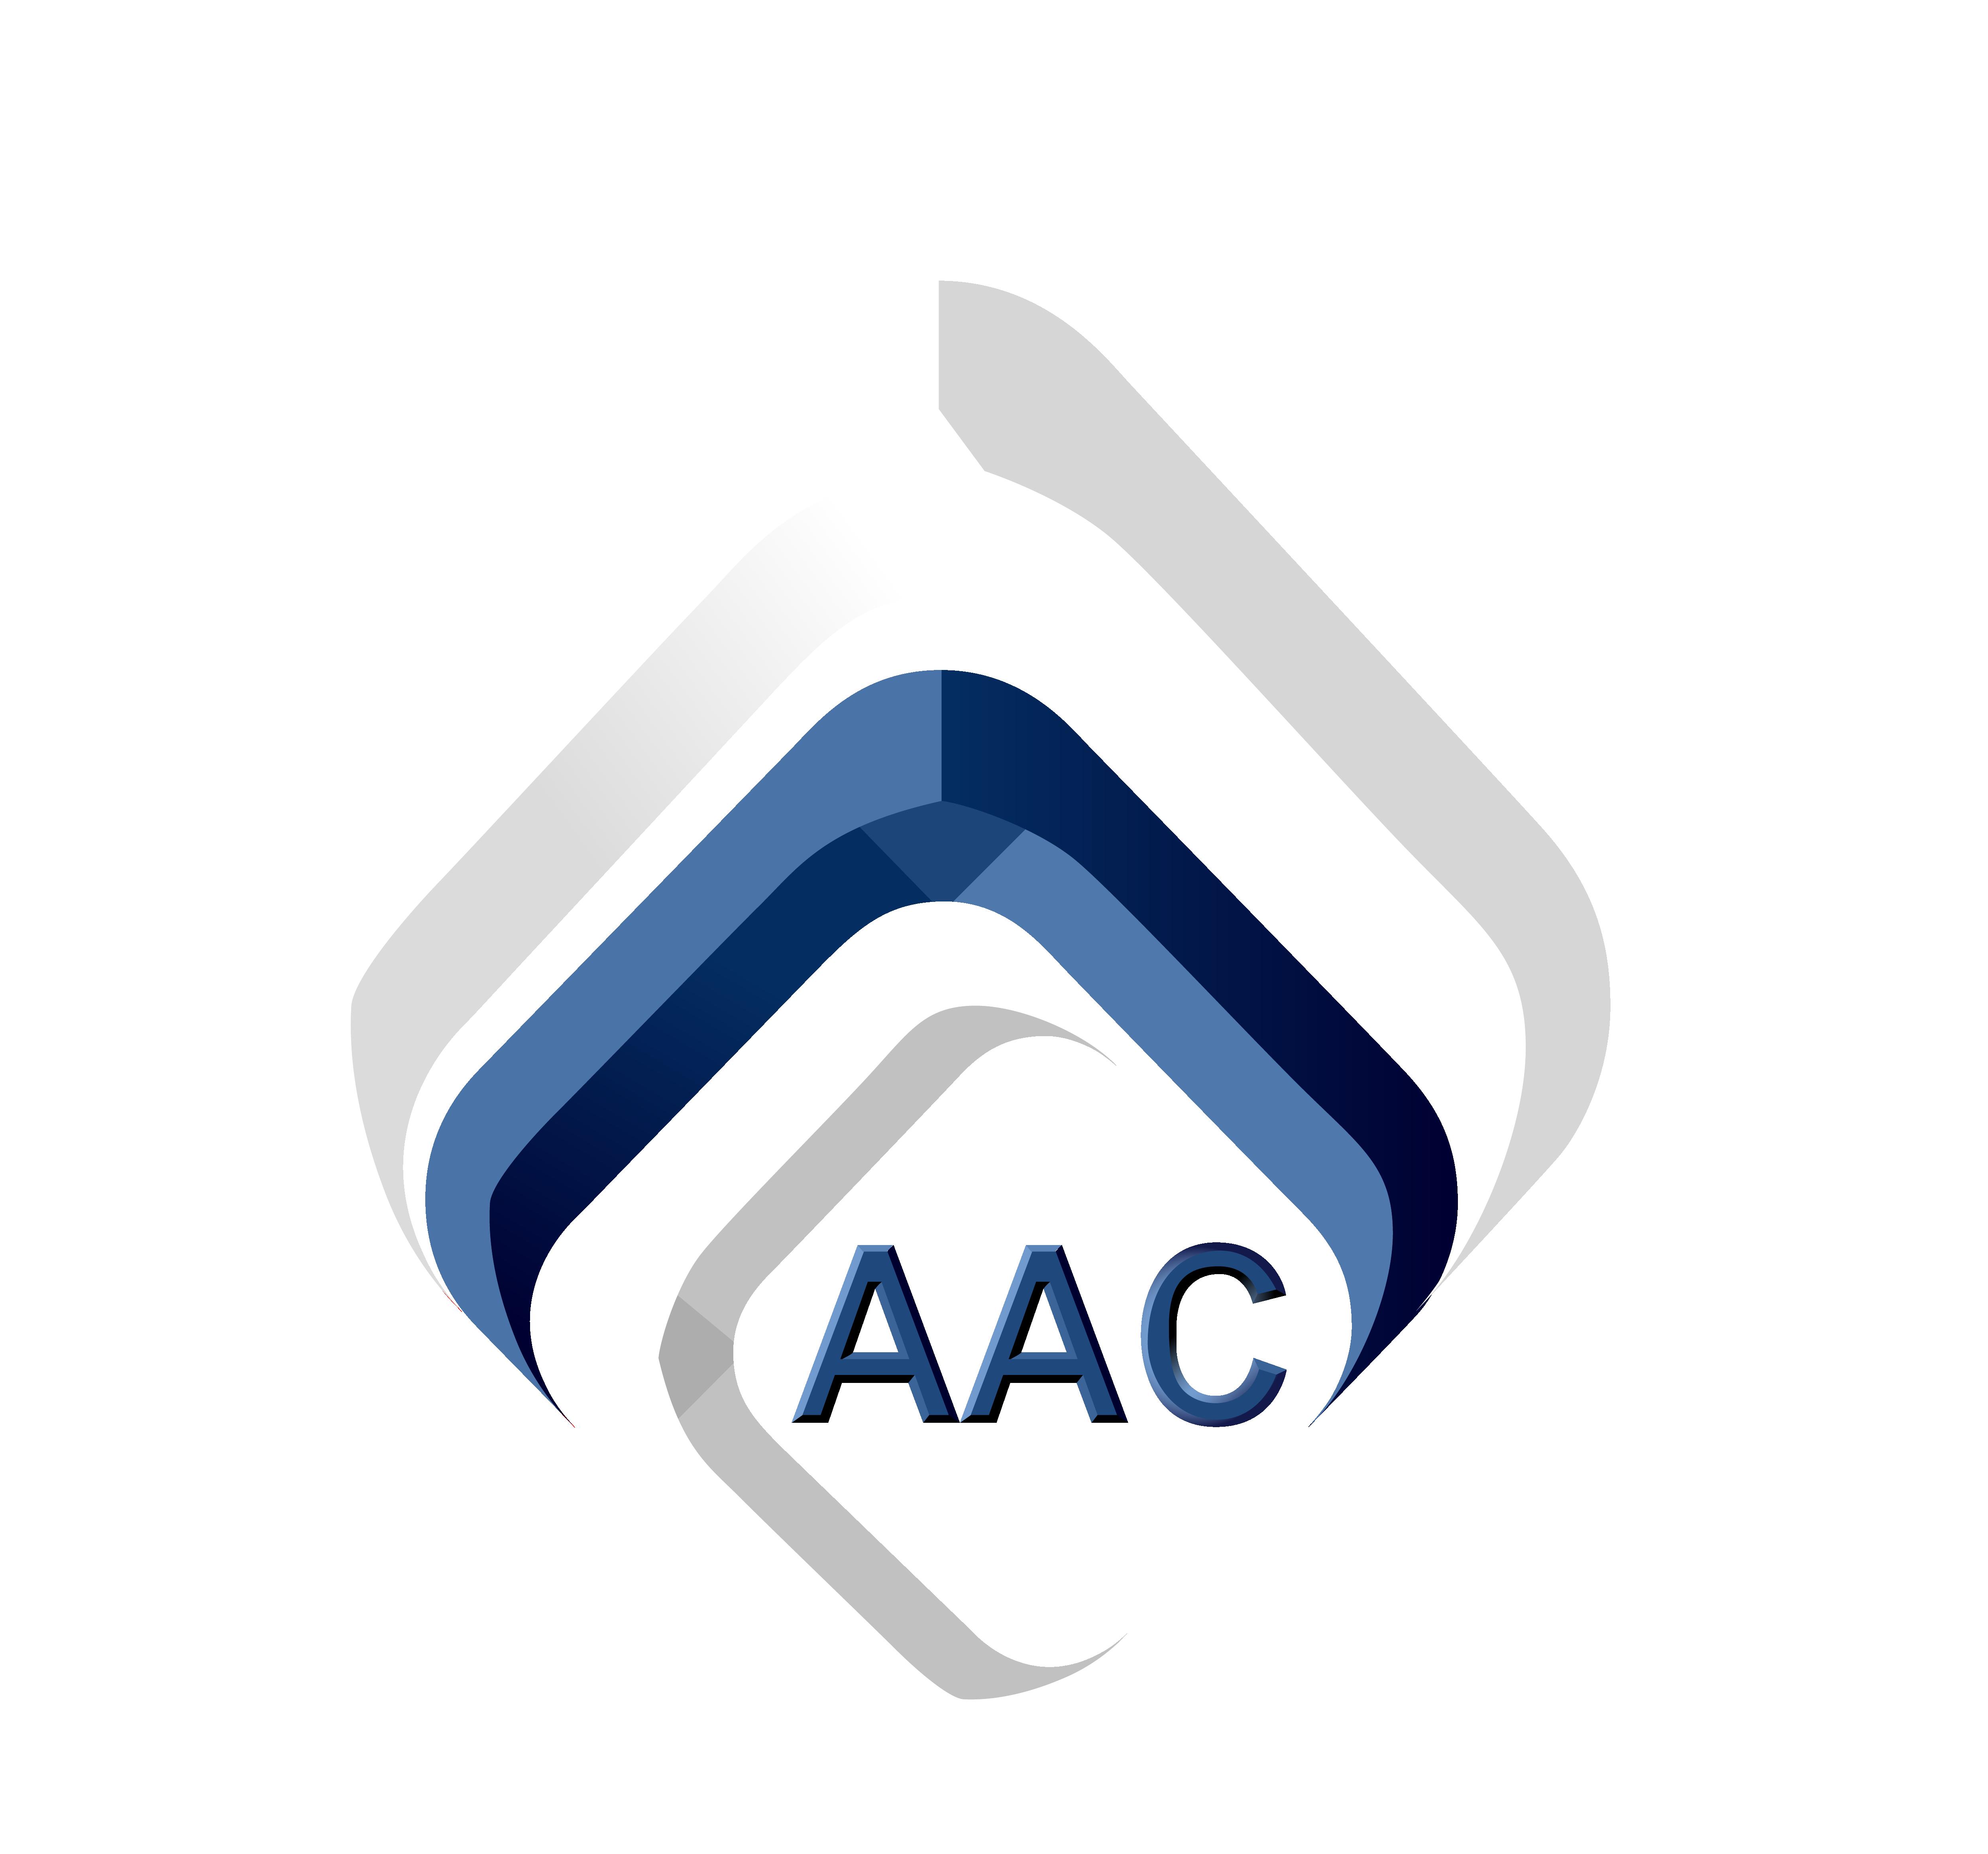 Logo - Aac, Transparent background PNG HD thumbnail